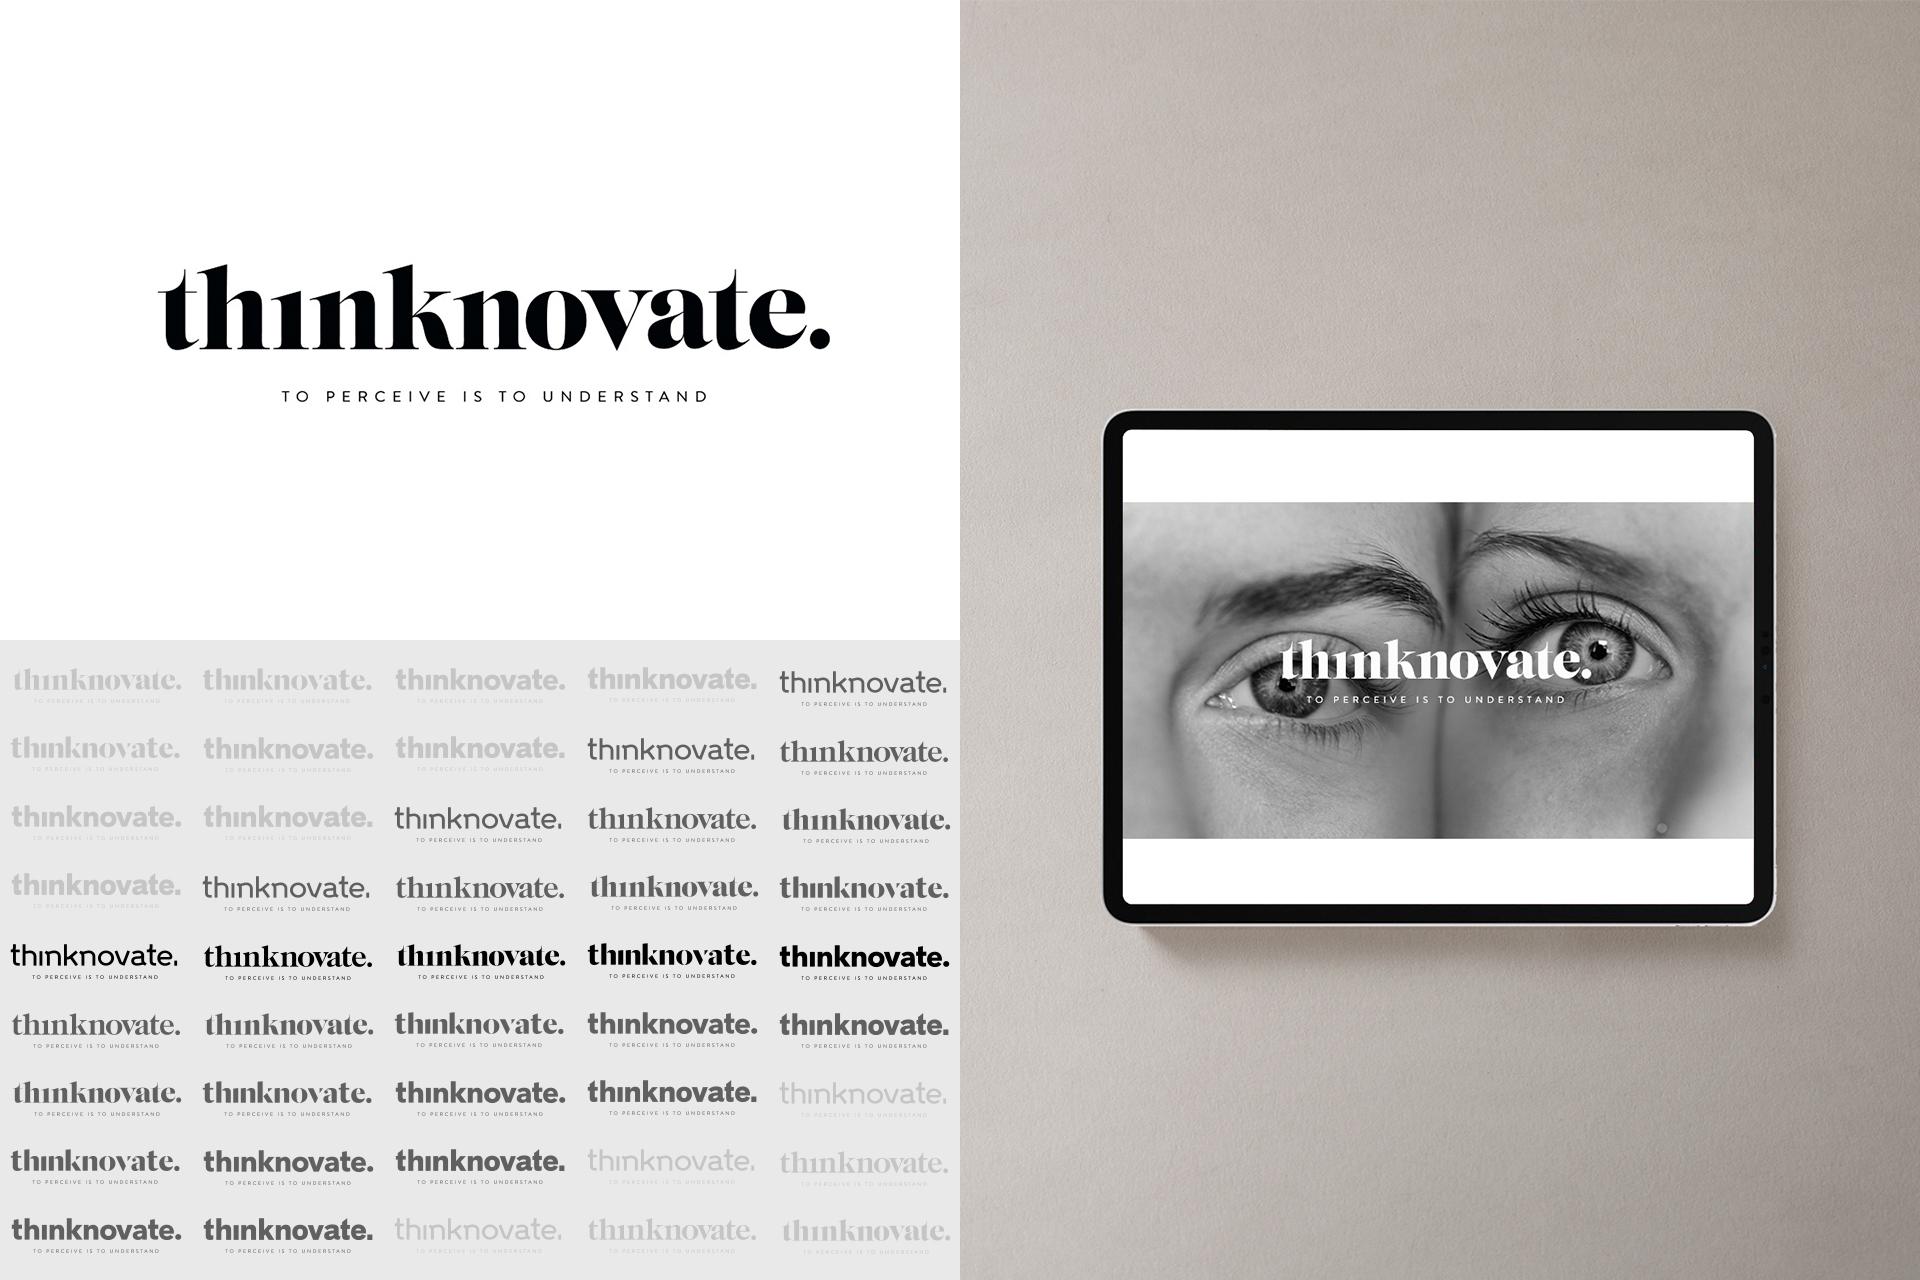 Thinknovate, Estrategia, Storytelling & Branding by Silenceworks - Creative Work